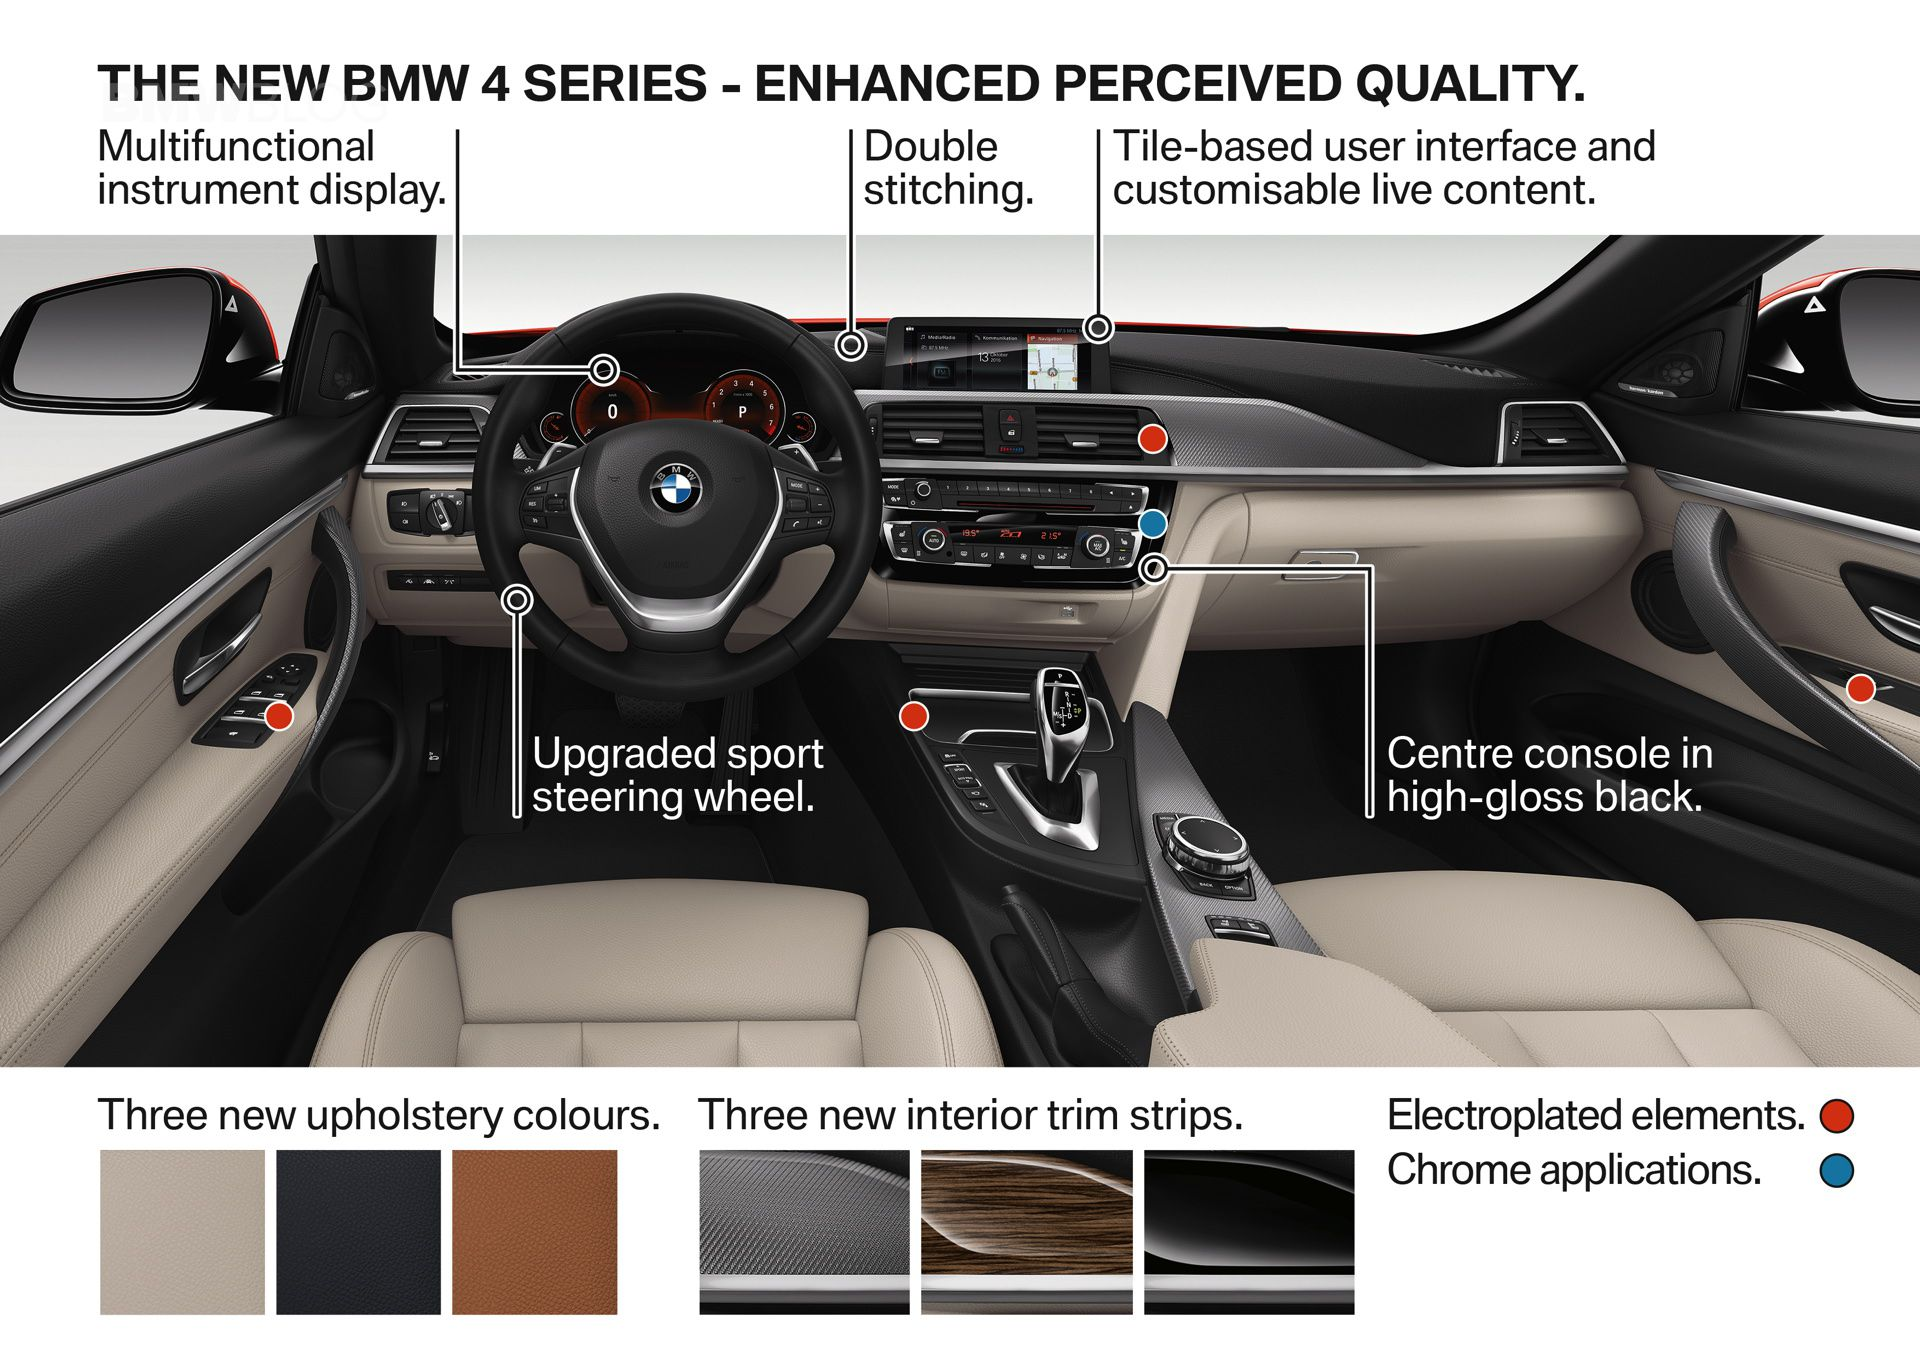 салон интерьер на BMW 4-й серии рестайлинг LCI facelift